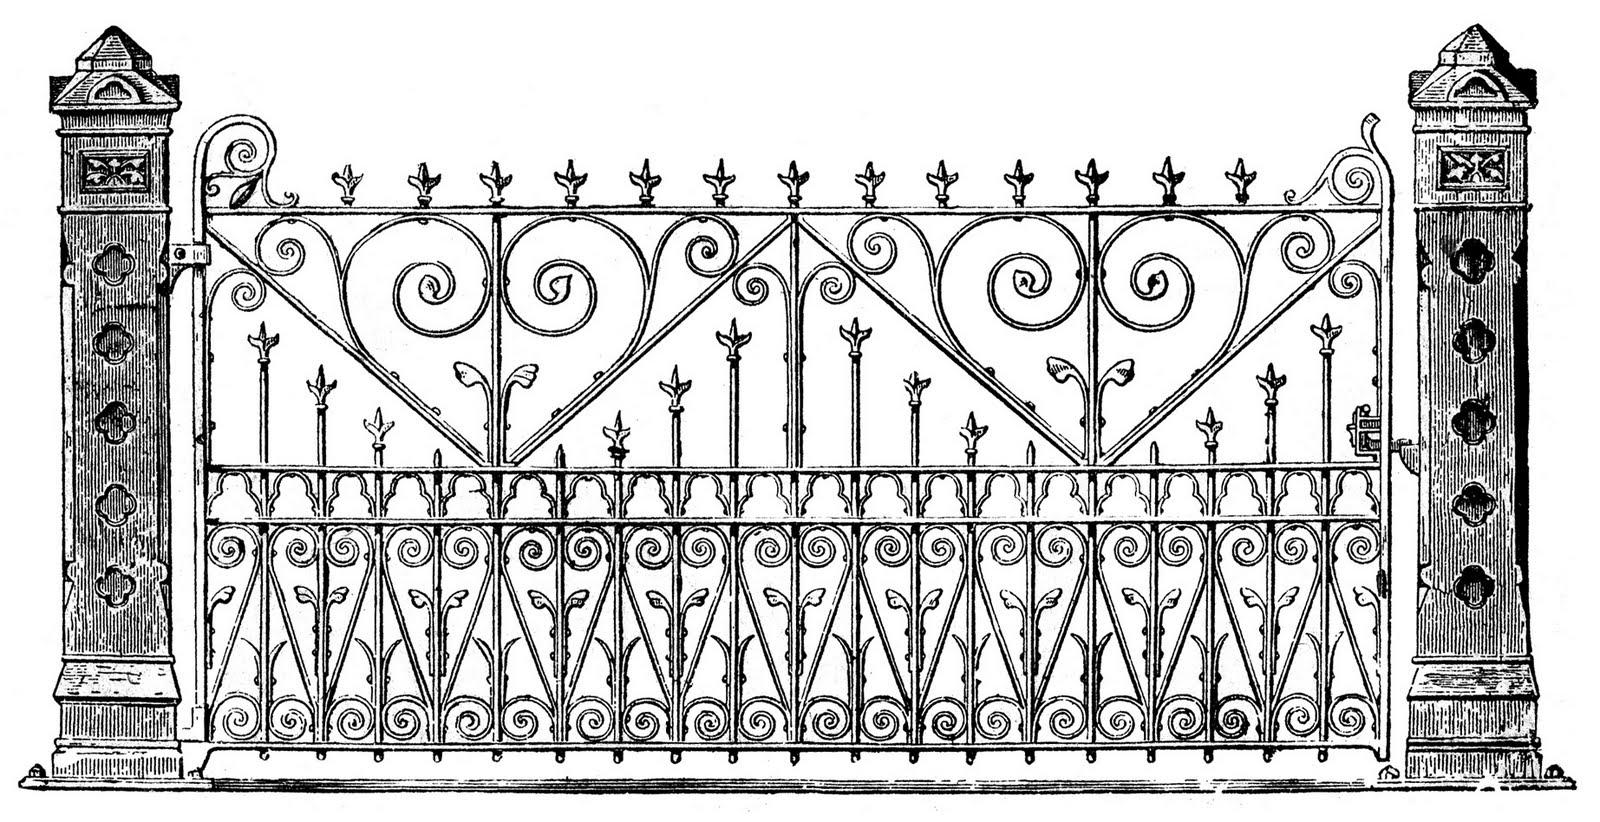 Victorian Clip Art - Ornate Iron Gate - The Graphics Fairy